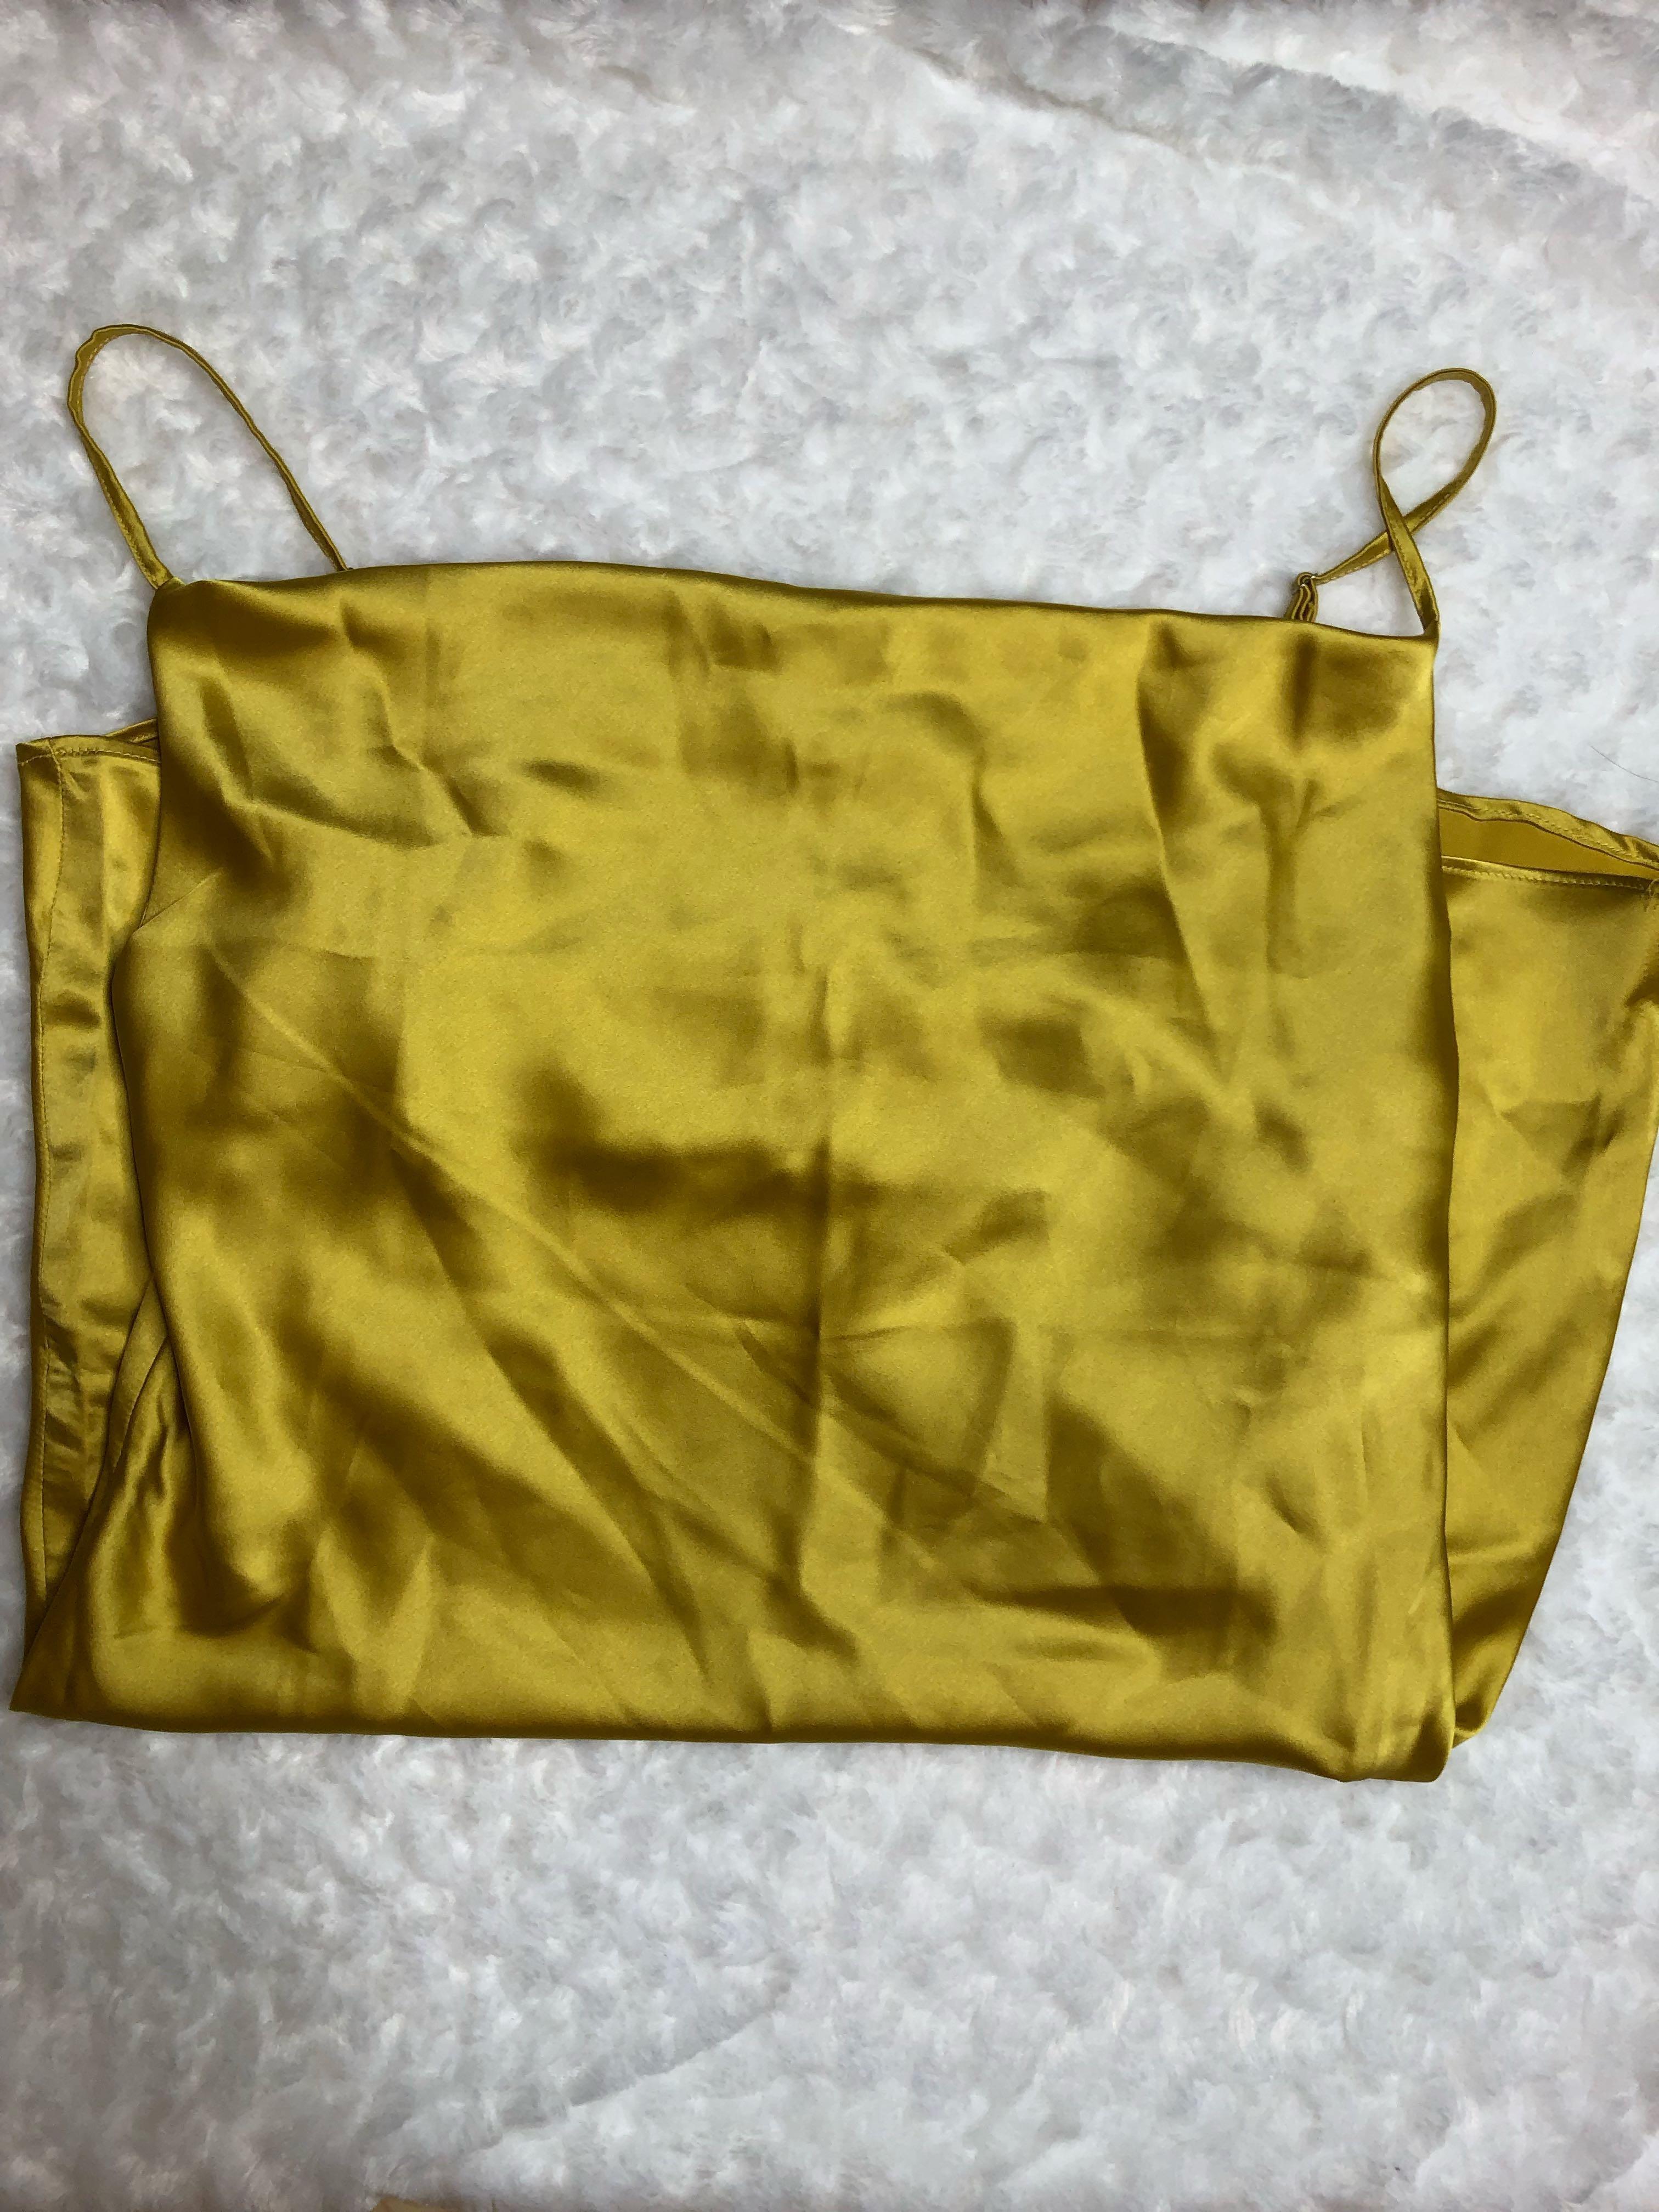 Whitefox Boutique - Yellow slip dress - Size medium